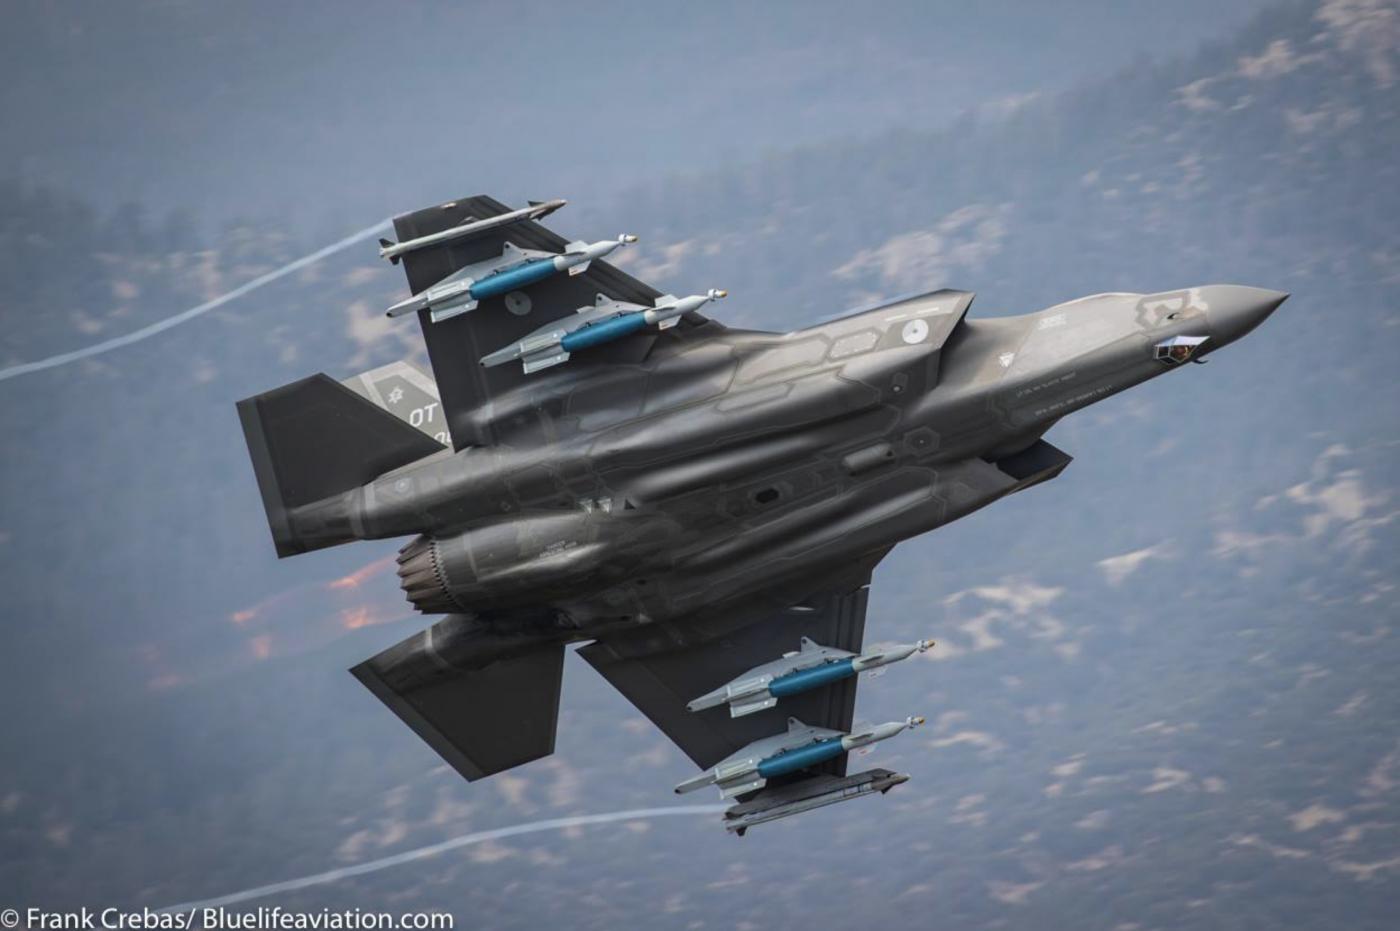 F16V还是F35:美台关系面临考验_图1-2